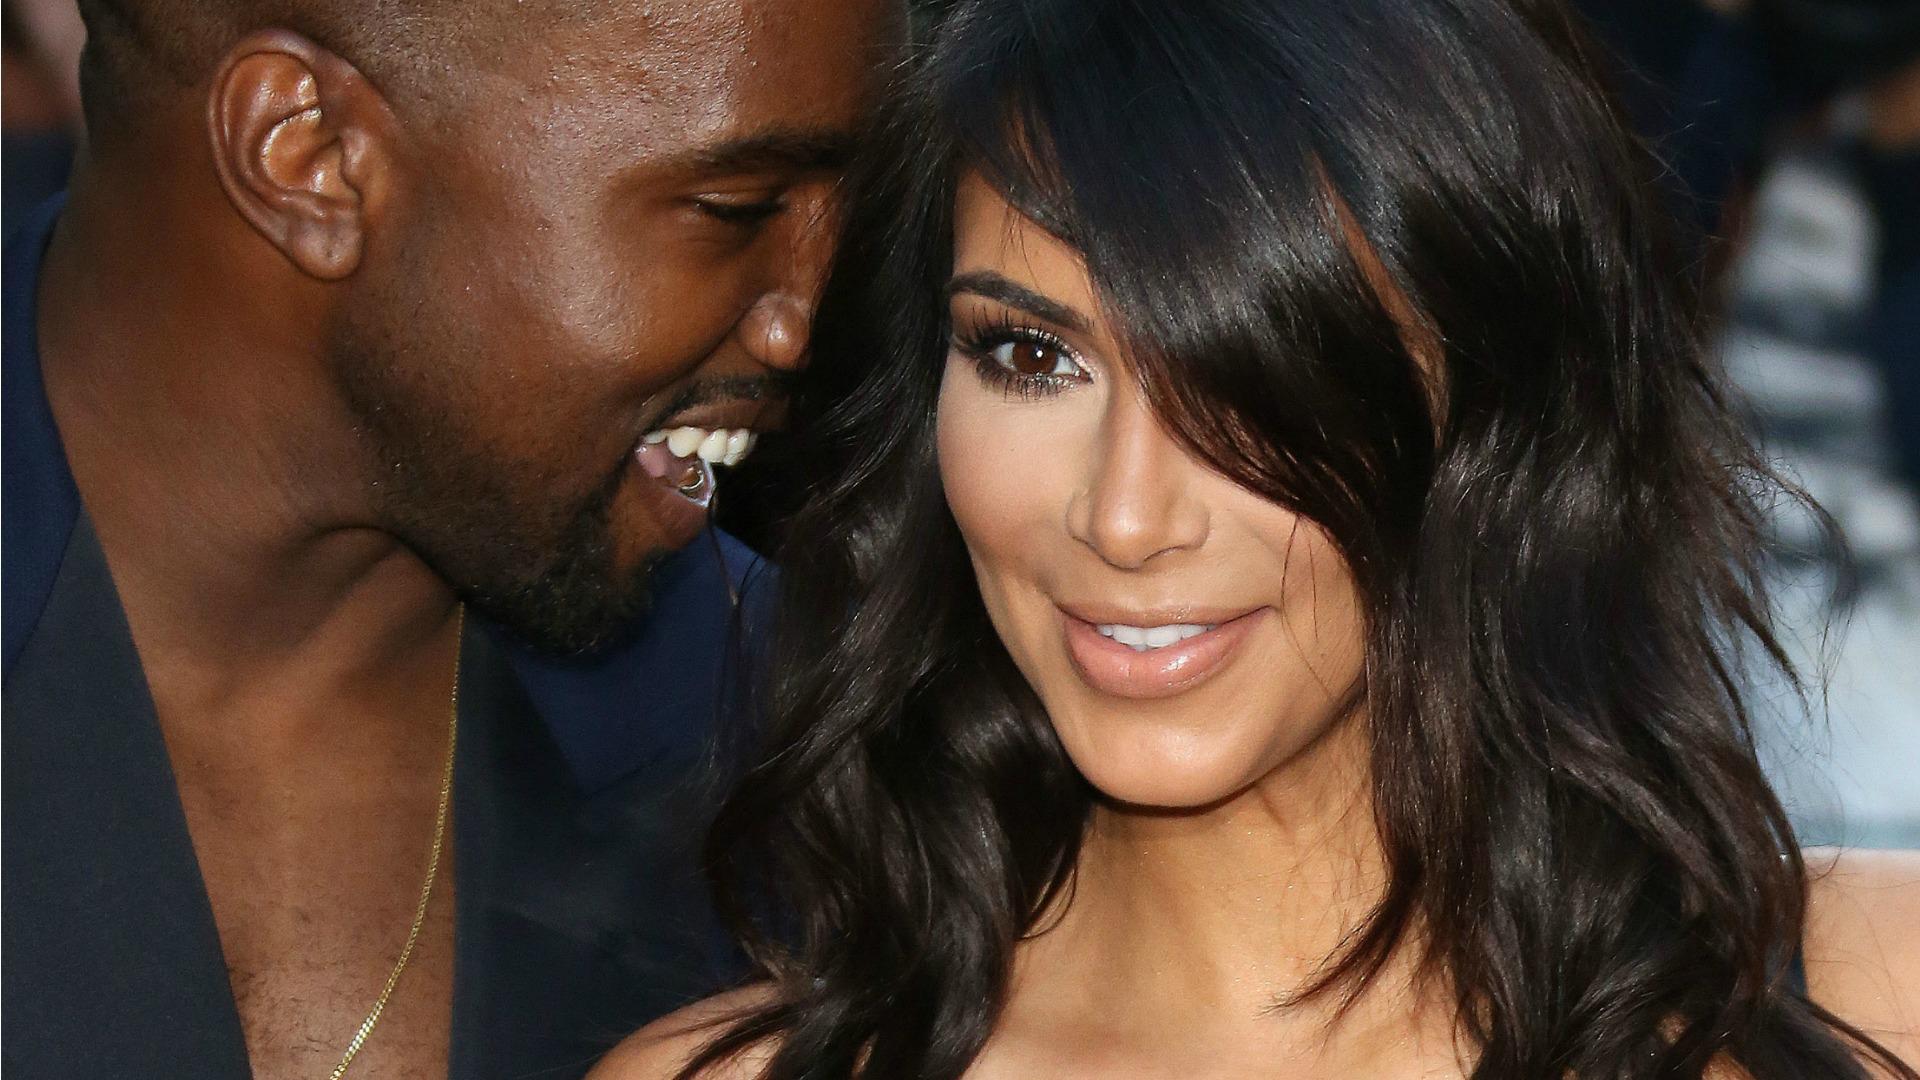 Kim Kardashian can't get pregnant again: Rumor or reality?